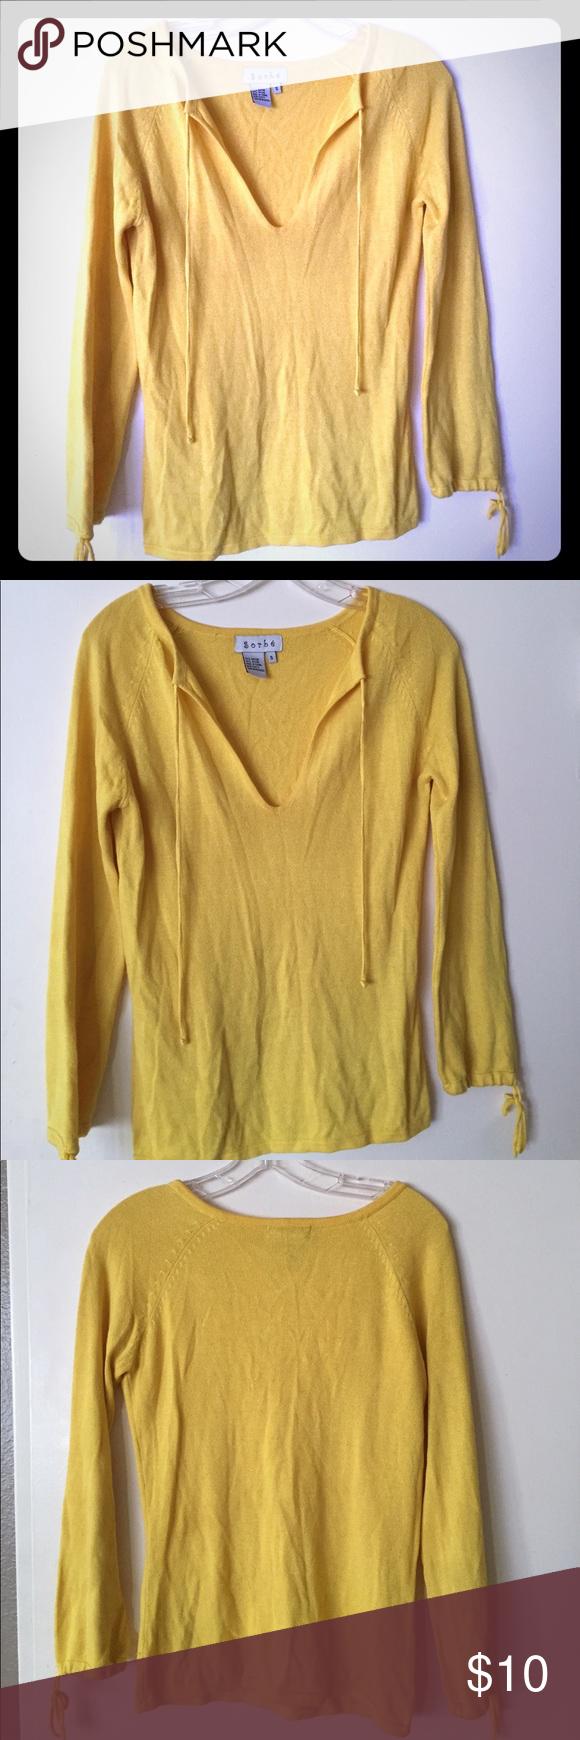 Cute! Yellow sweater/shirt